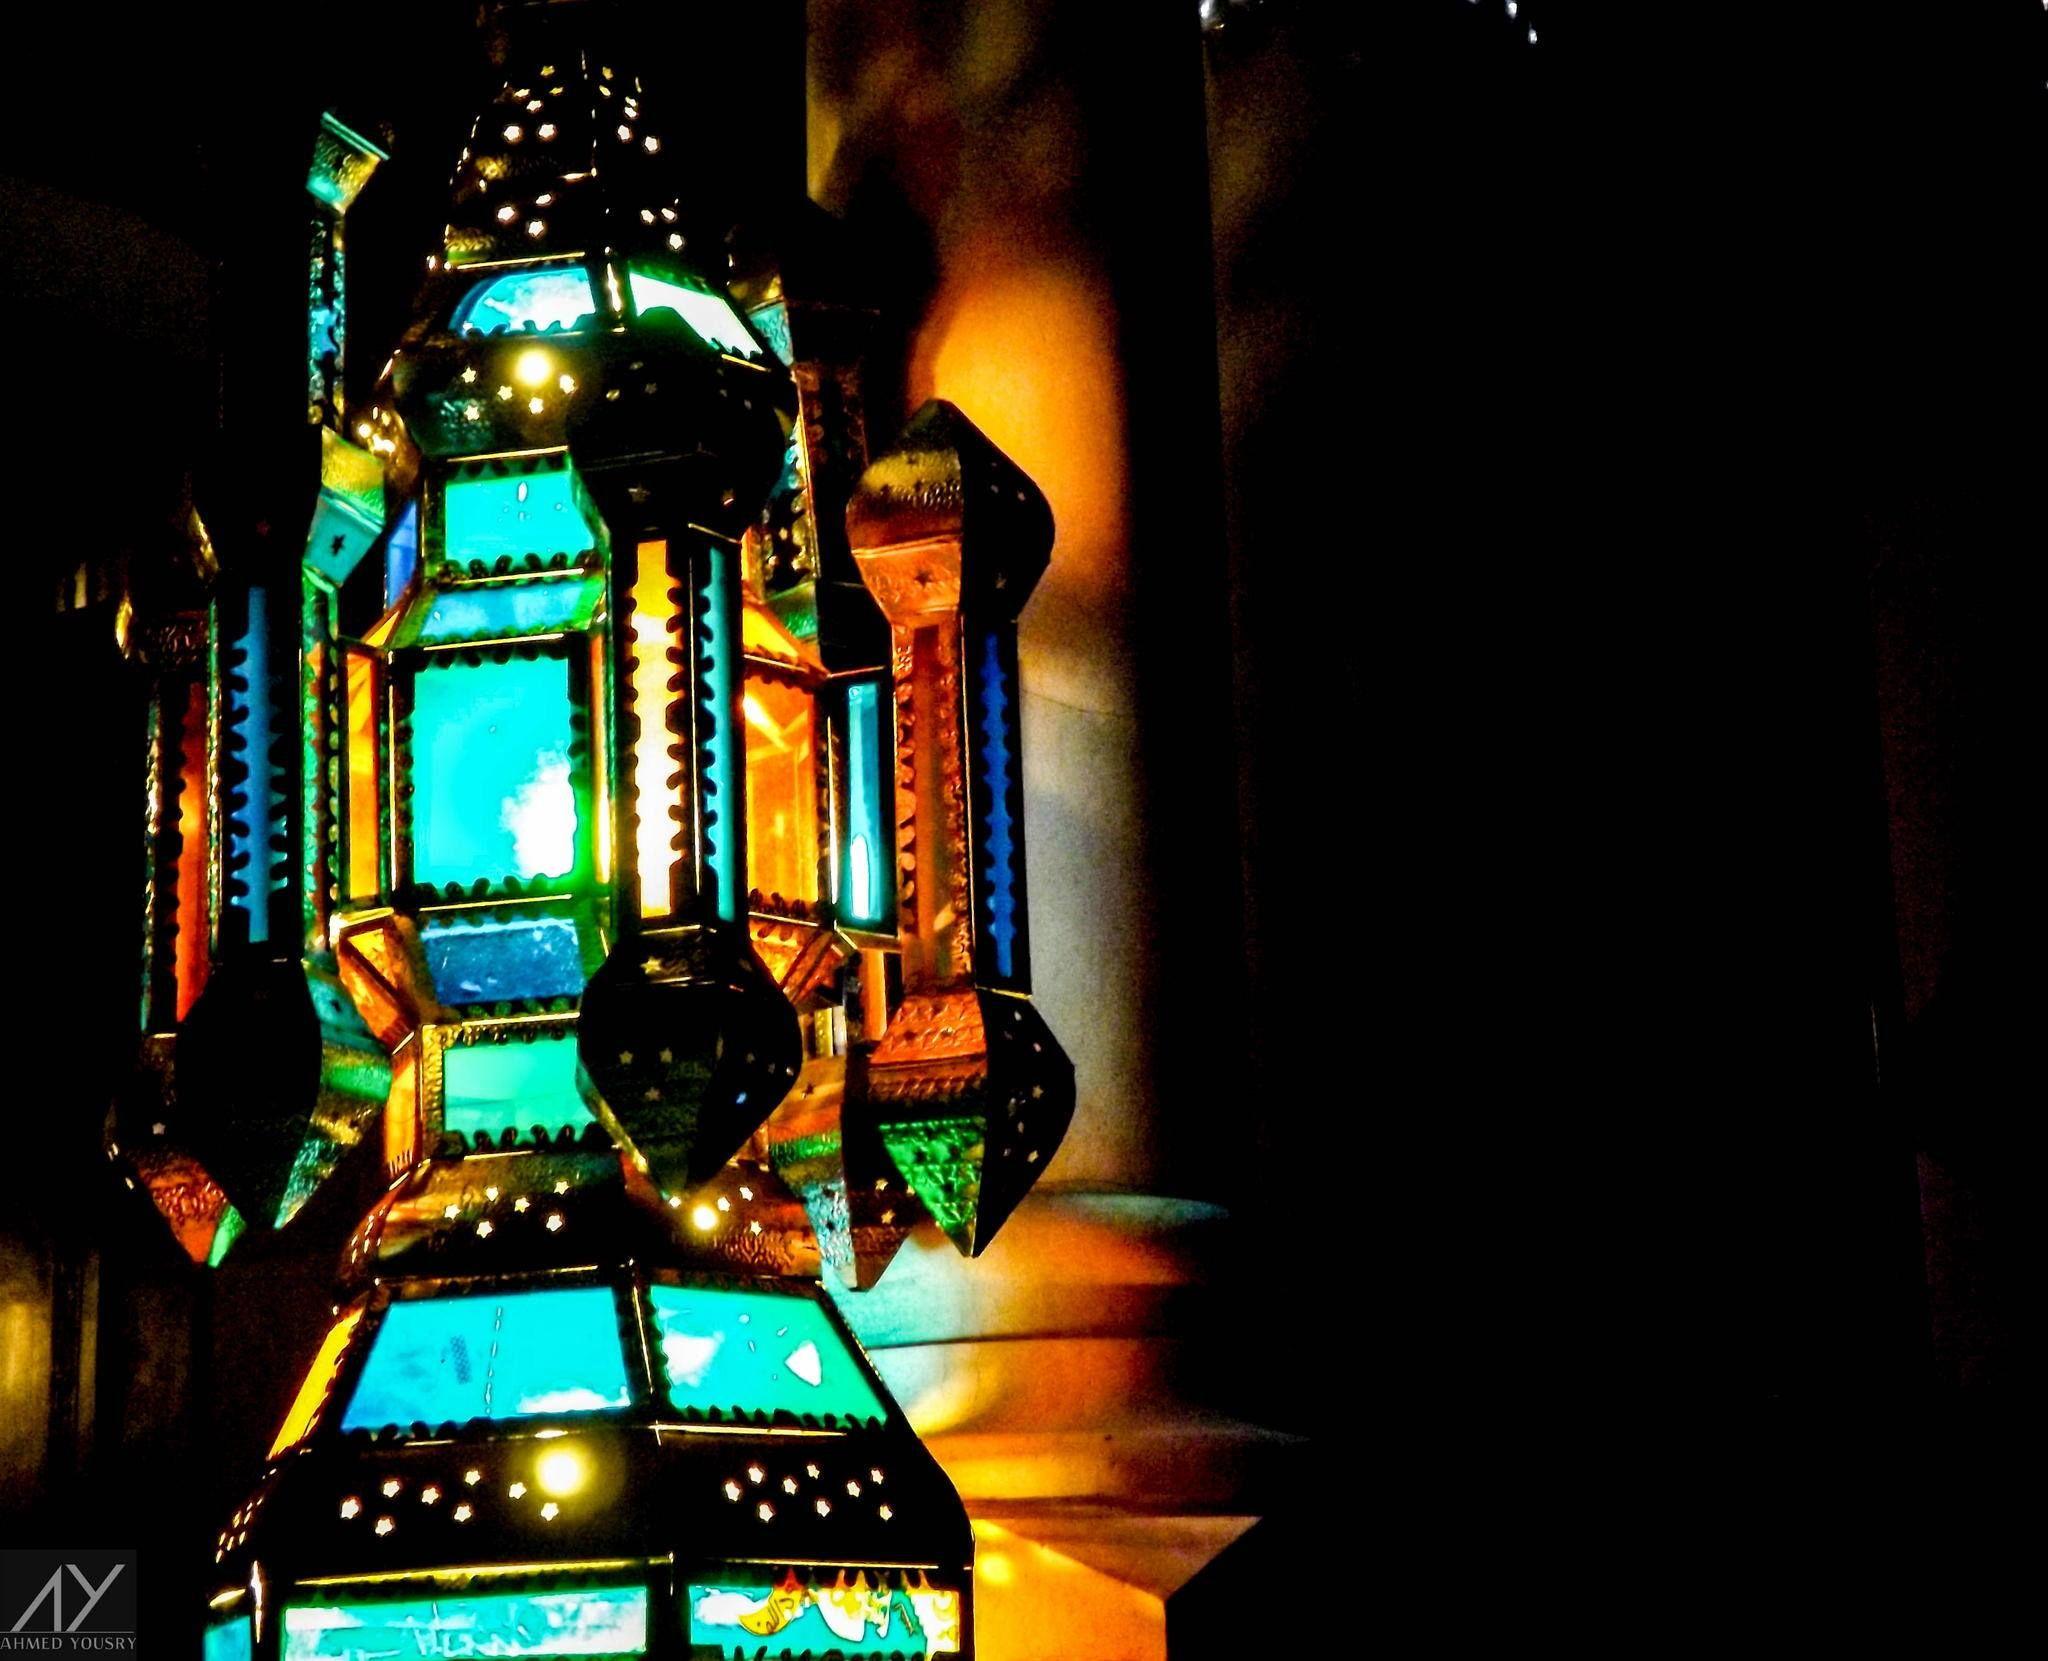 صور فانوس رمضان 2021 اجدد خلفيات فوانيس رمضان Ramadan Lantern Islamic Images Islamic Art Calligraphy